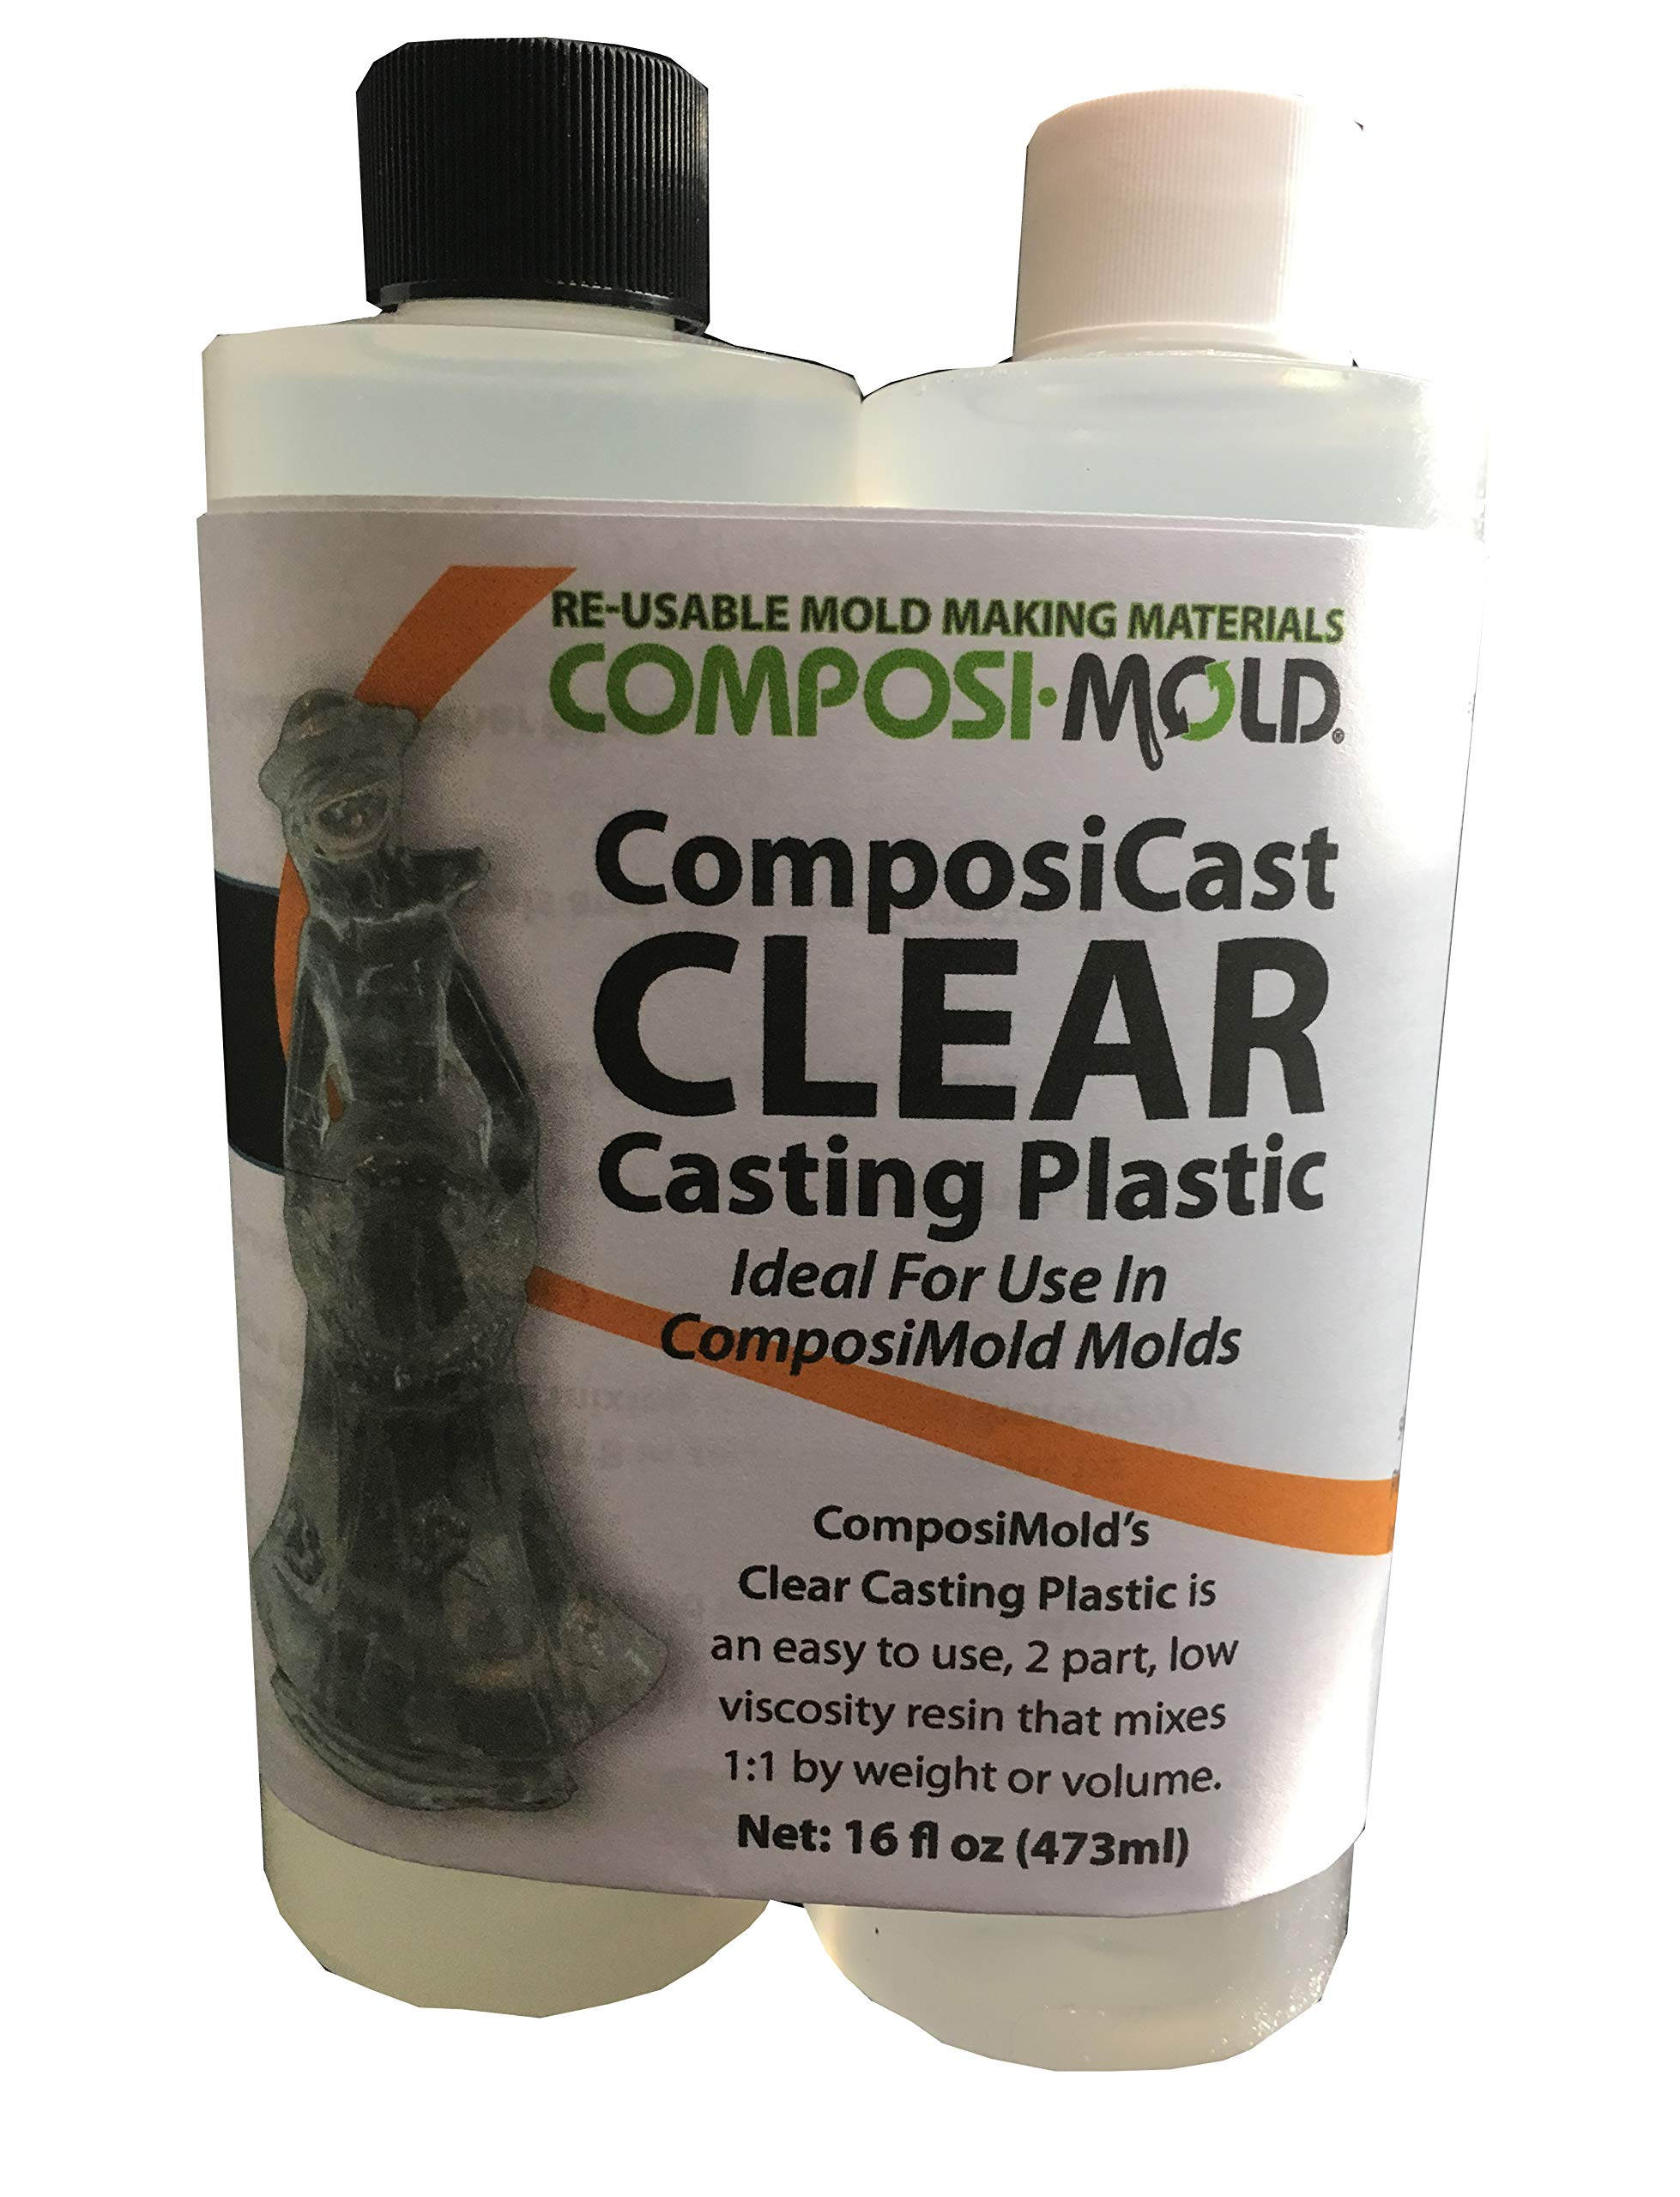 ComposiMold Clear Casting Plastic, 16 oz by ComposiMold